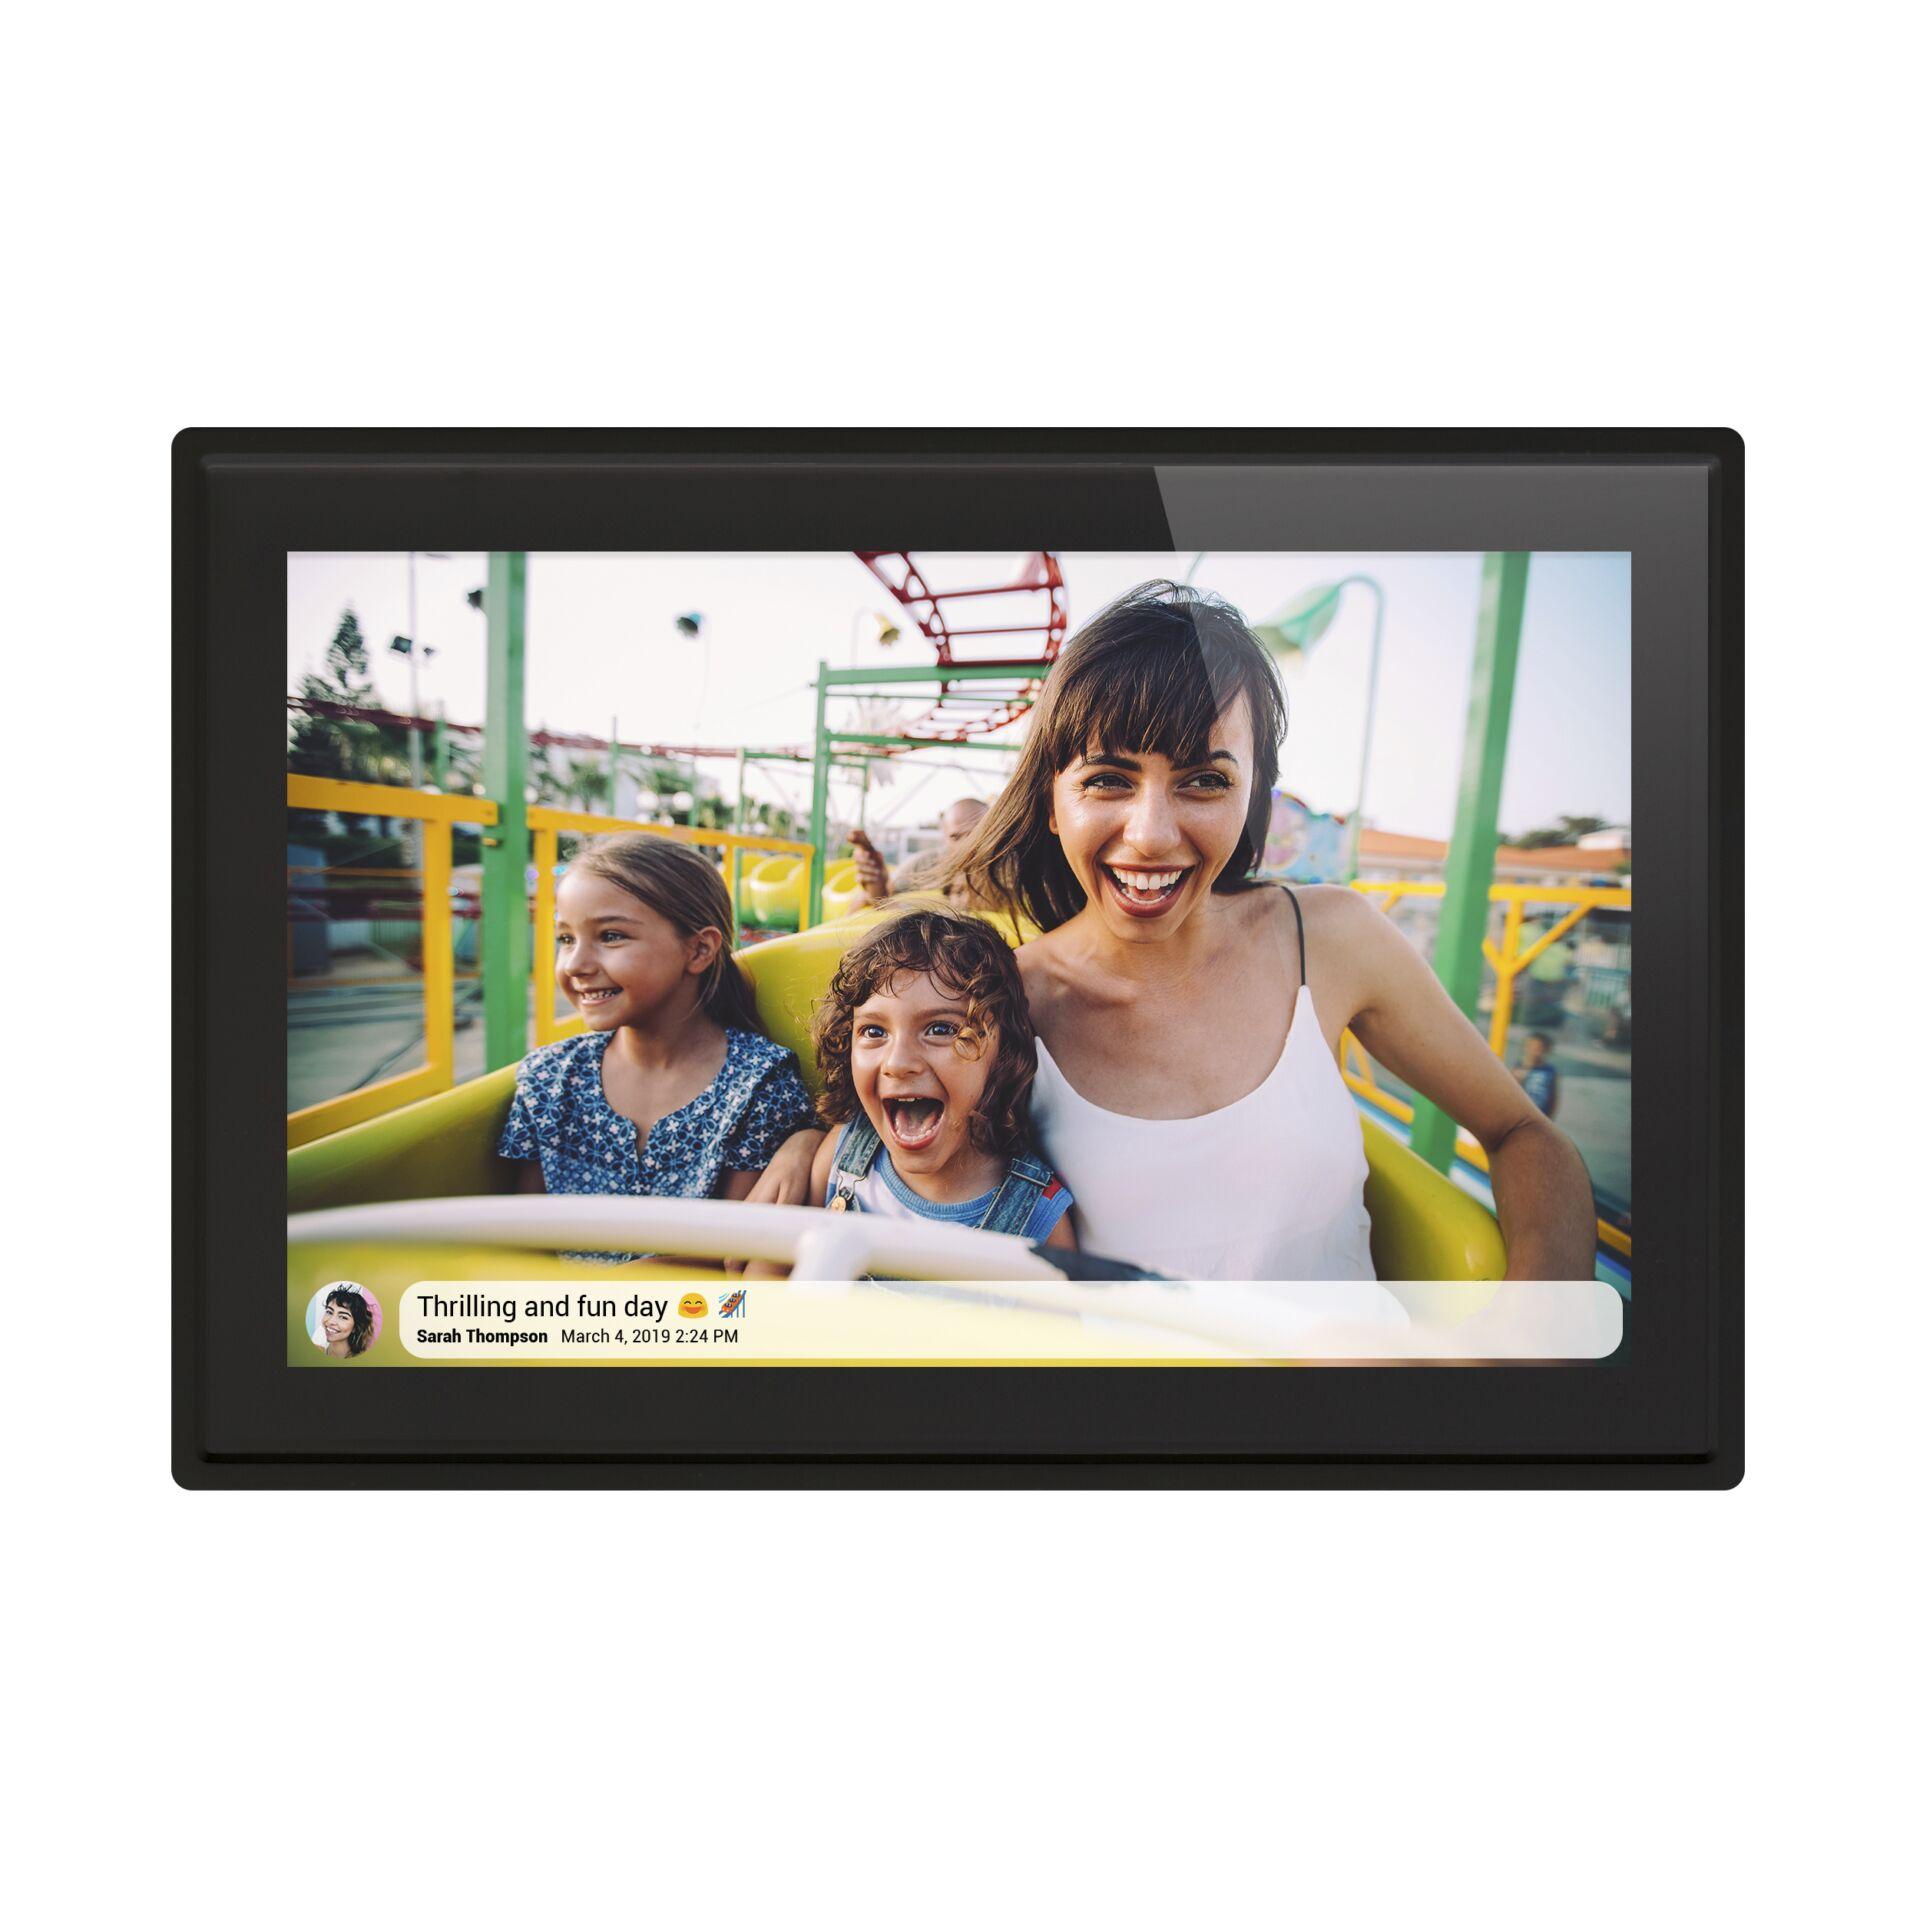 Braun DigiFrame 1019 WiFi 25,7cm black (10,1 inch)